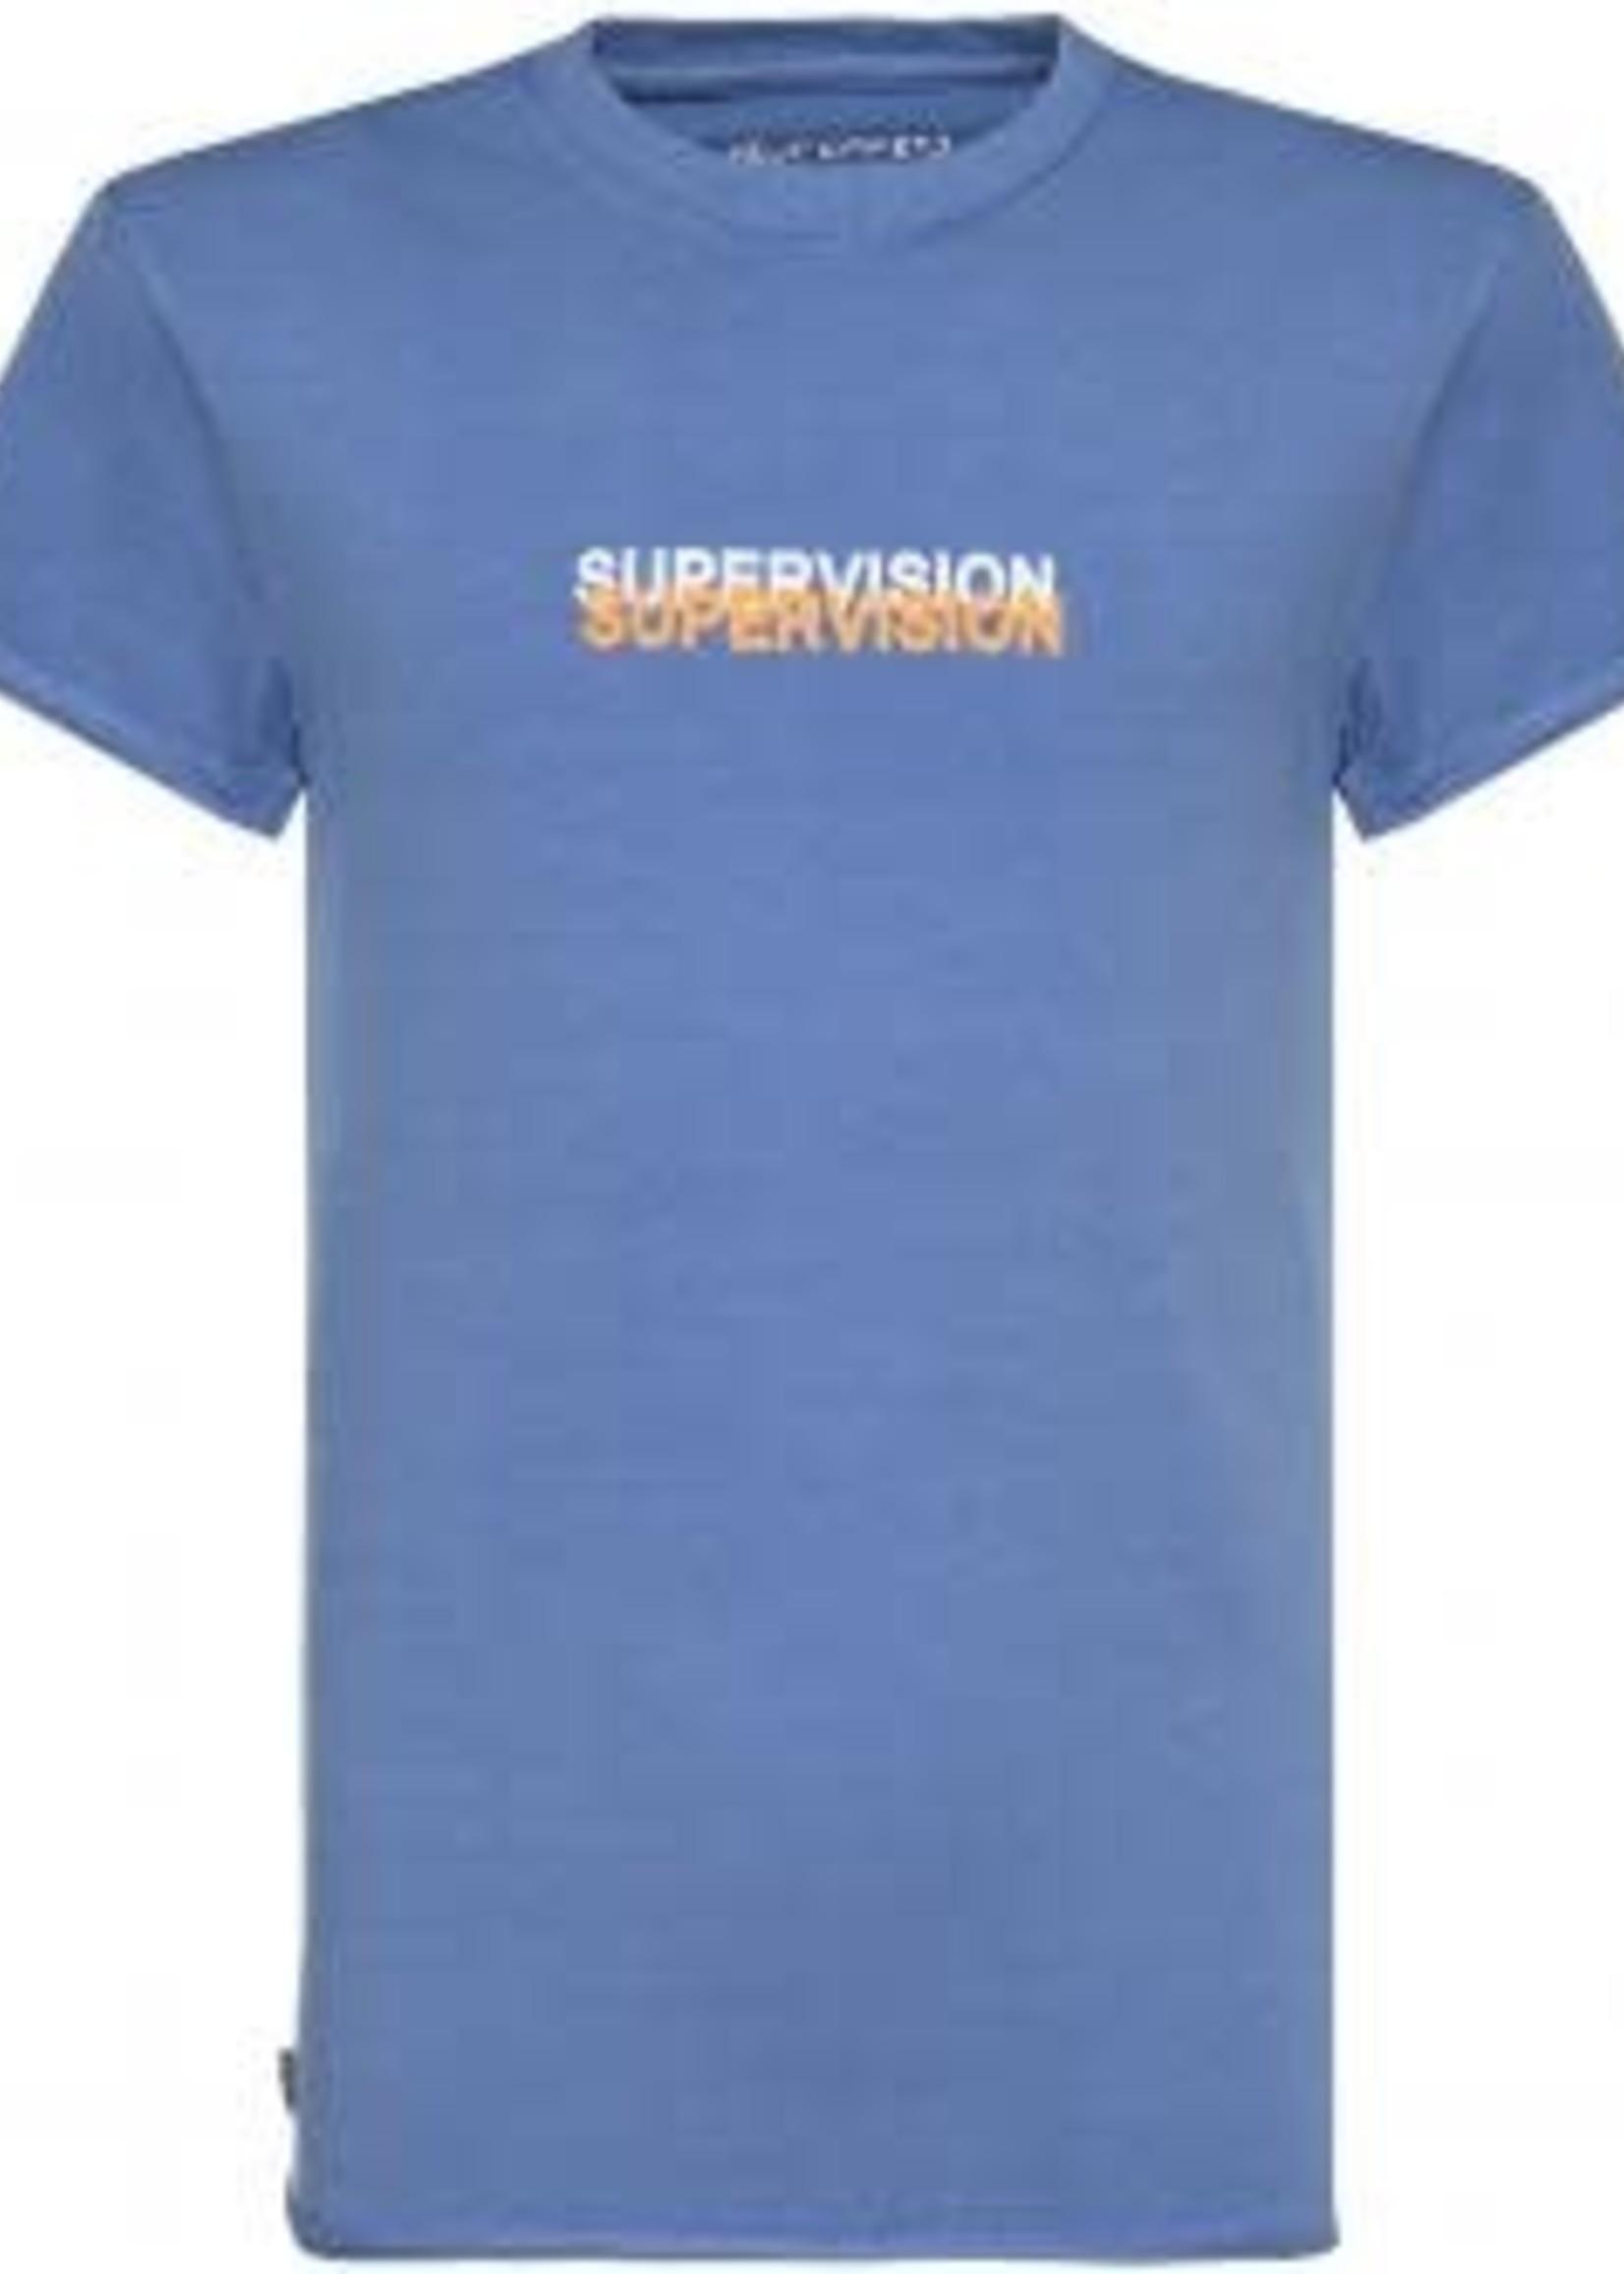 Blue Effect T-shirt Supervision